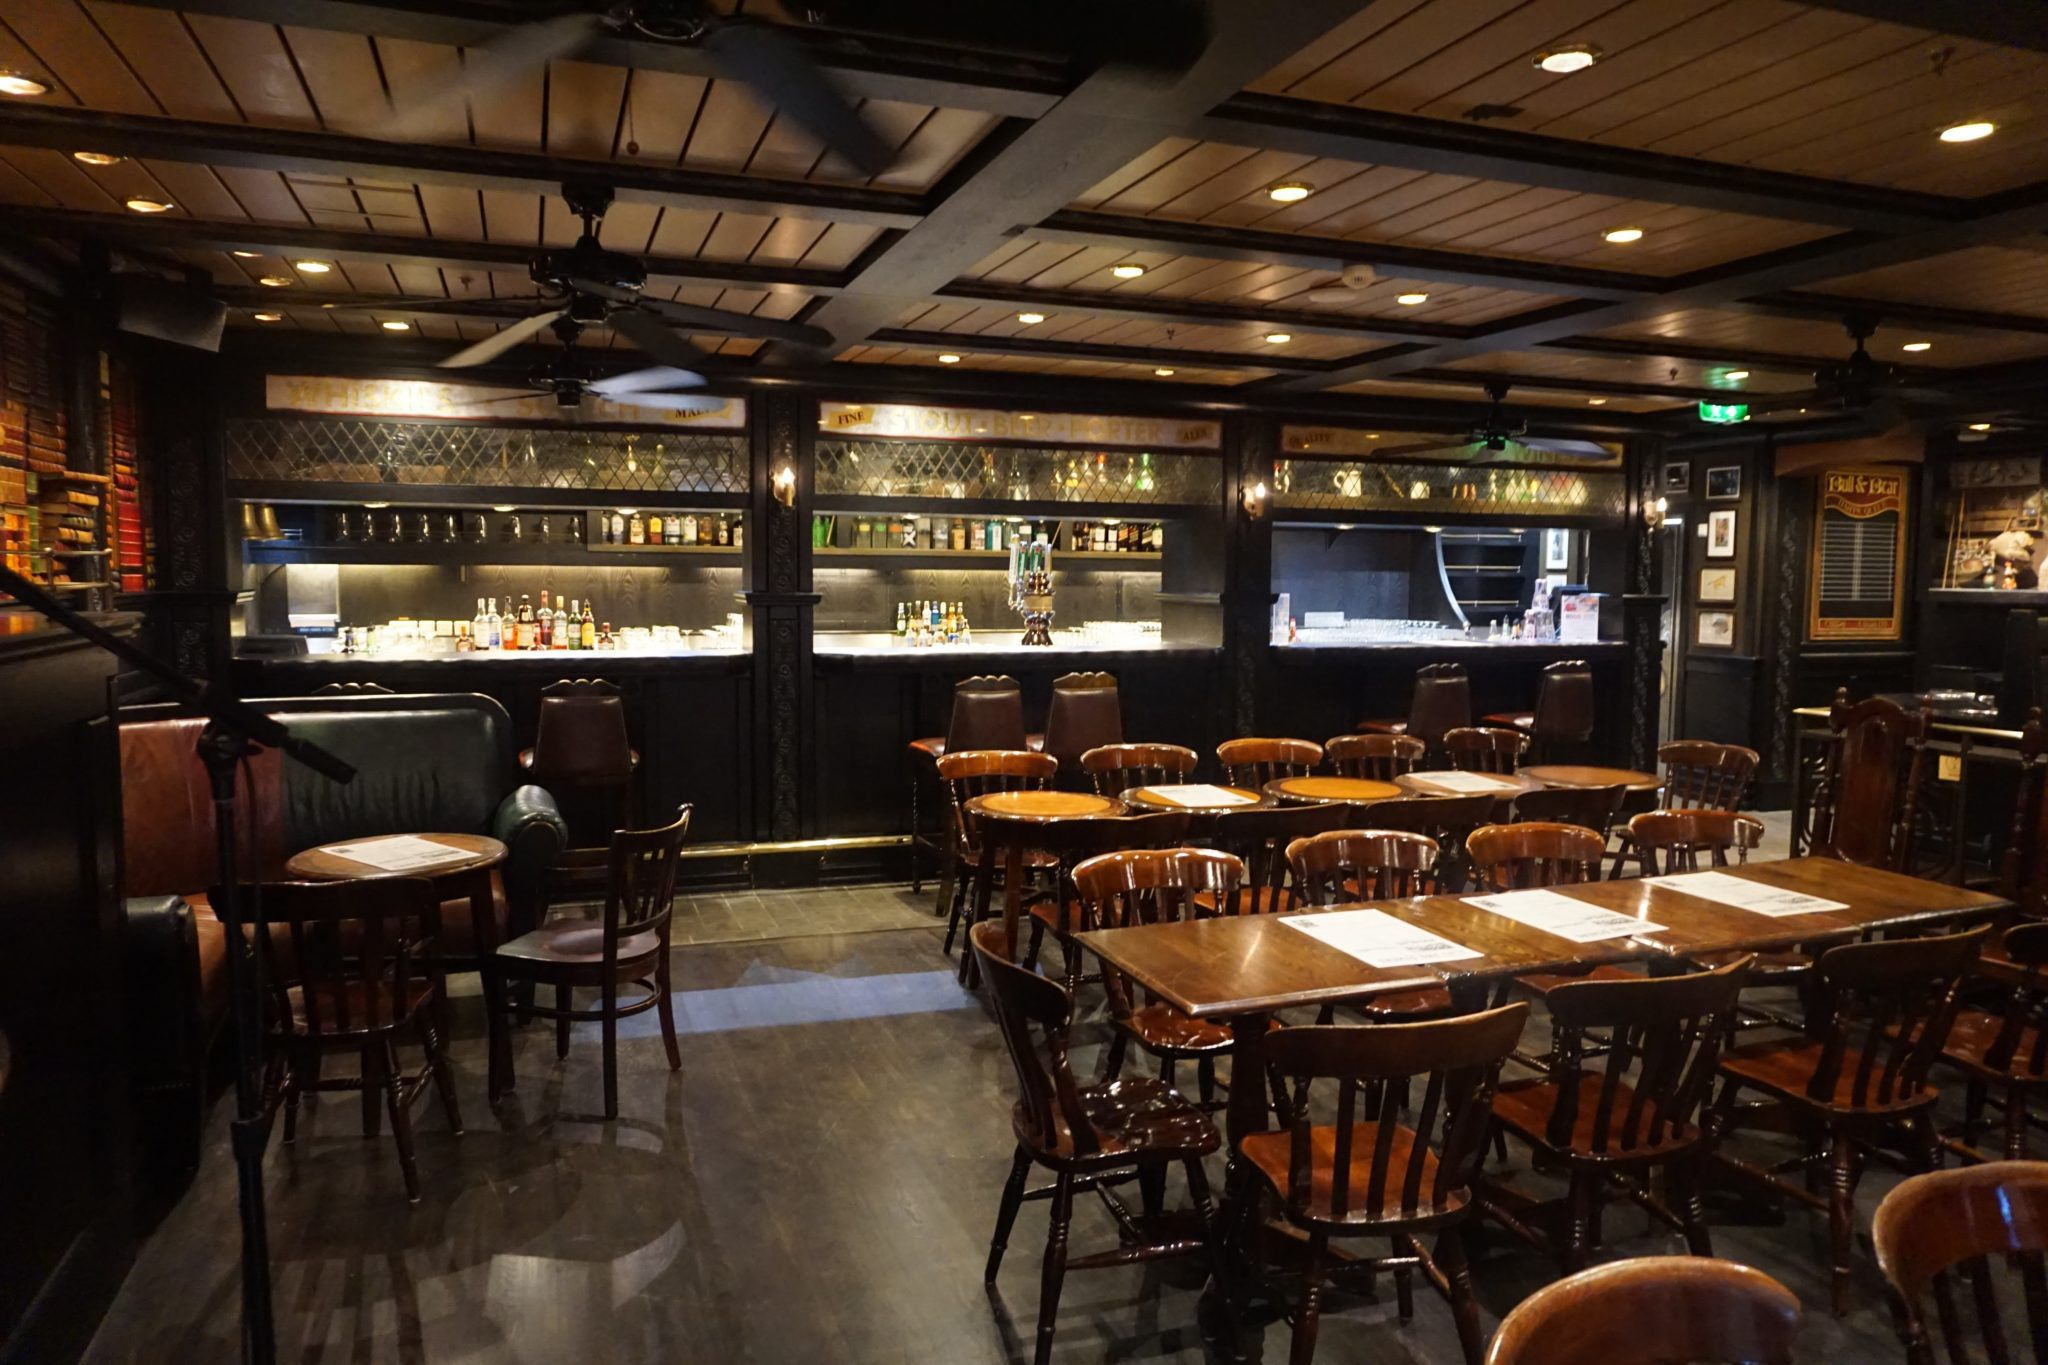 Bar Menus for Freedom of the Seas